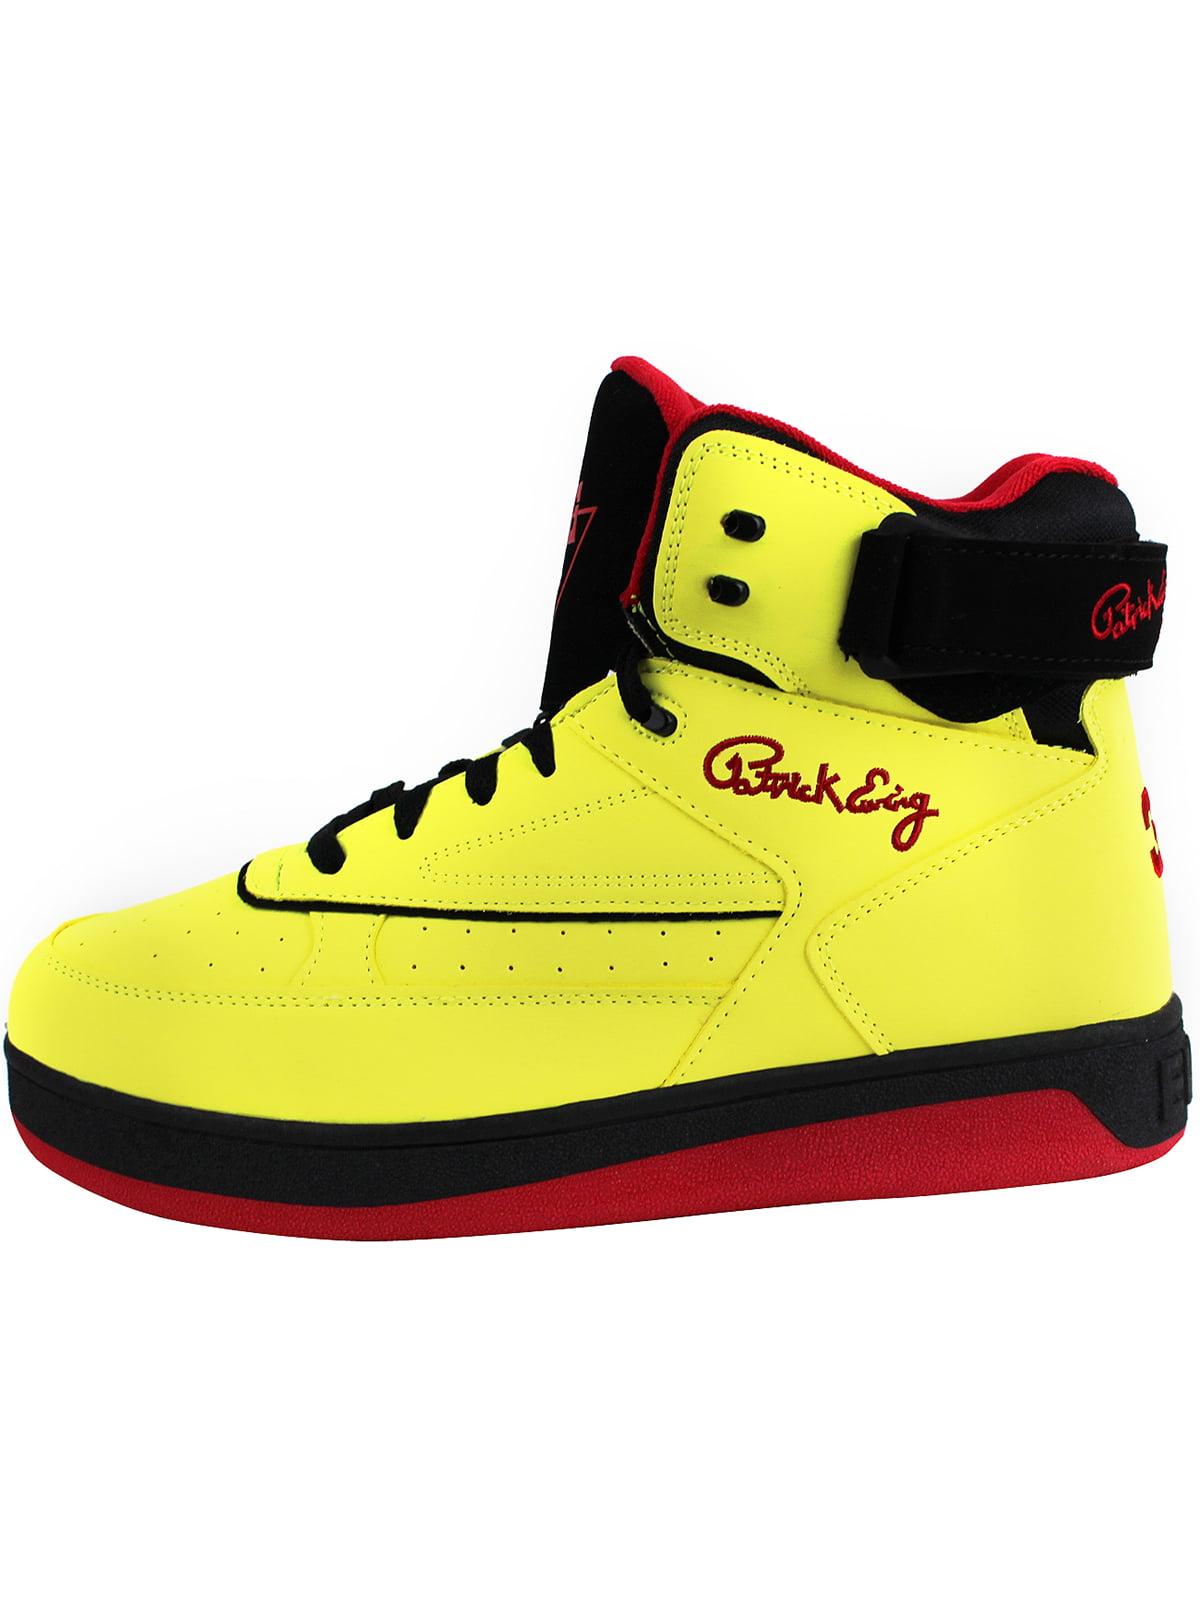 patrick ewing orion shoes